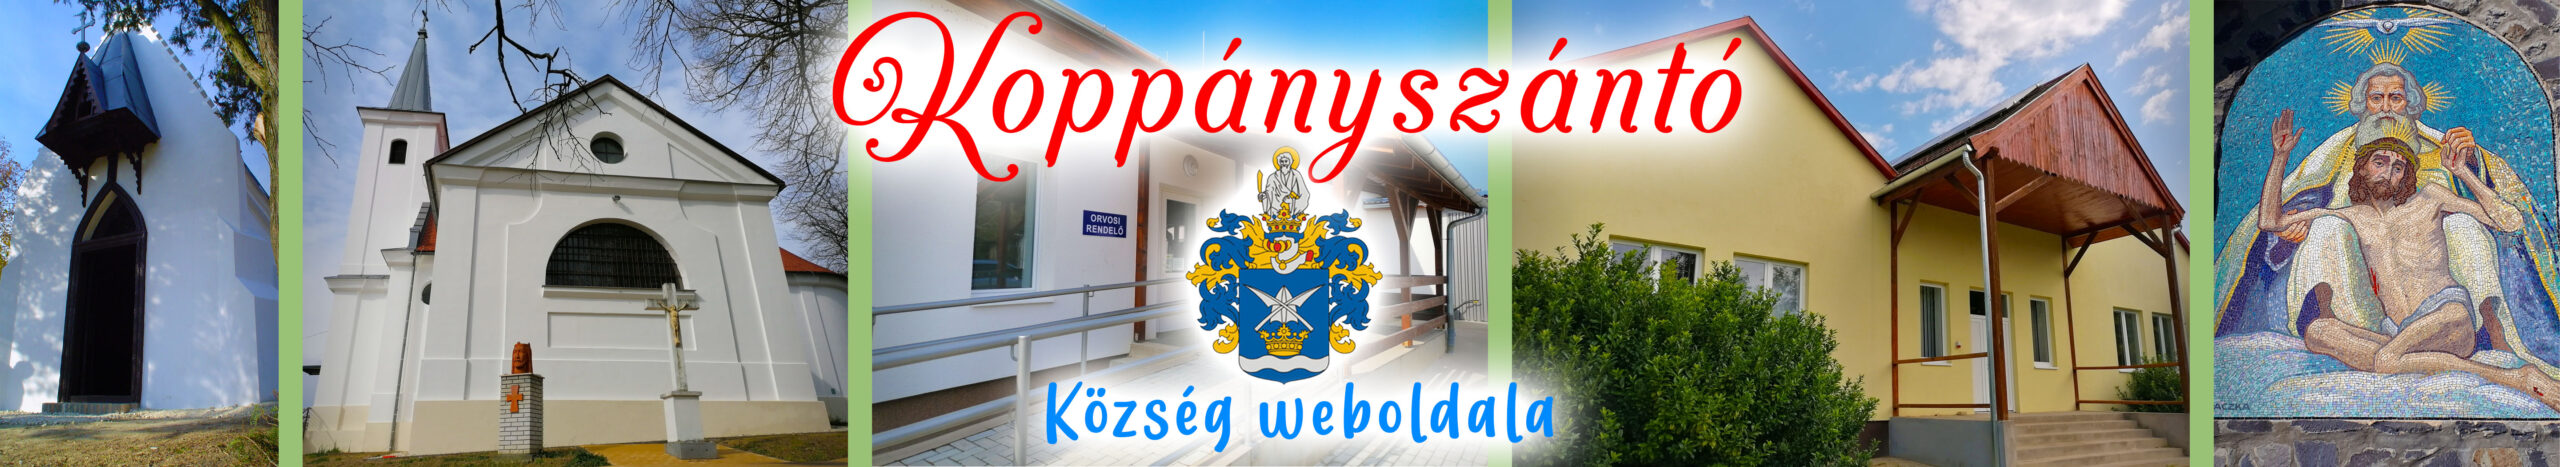 Koppanyszanto.hu